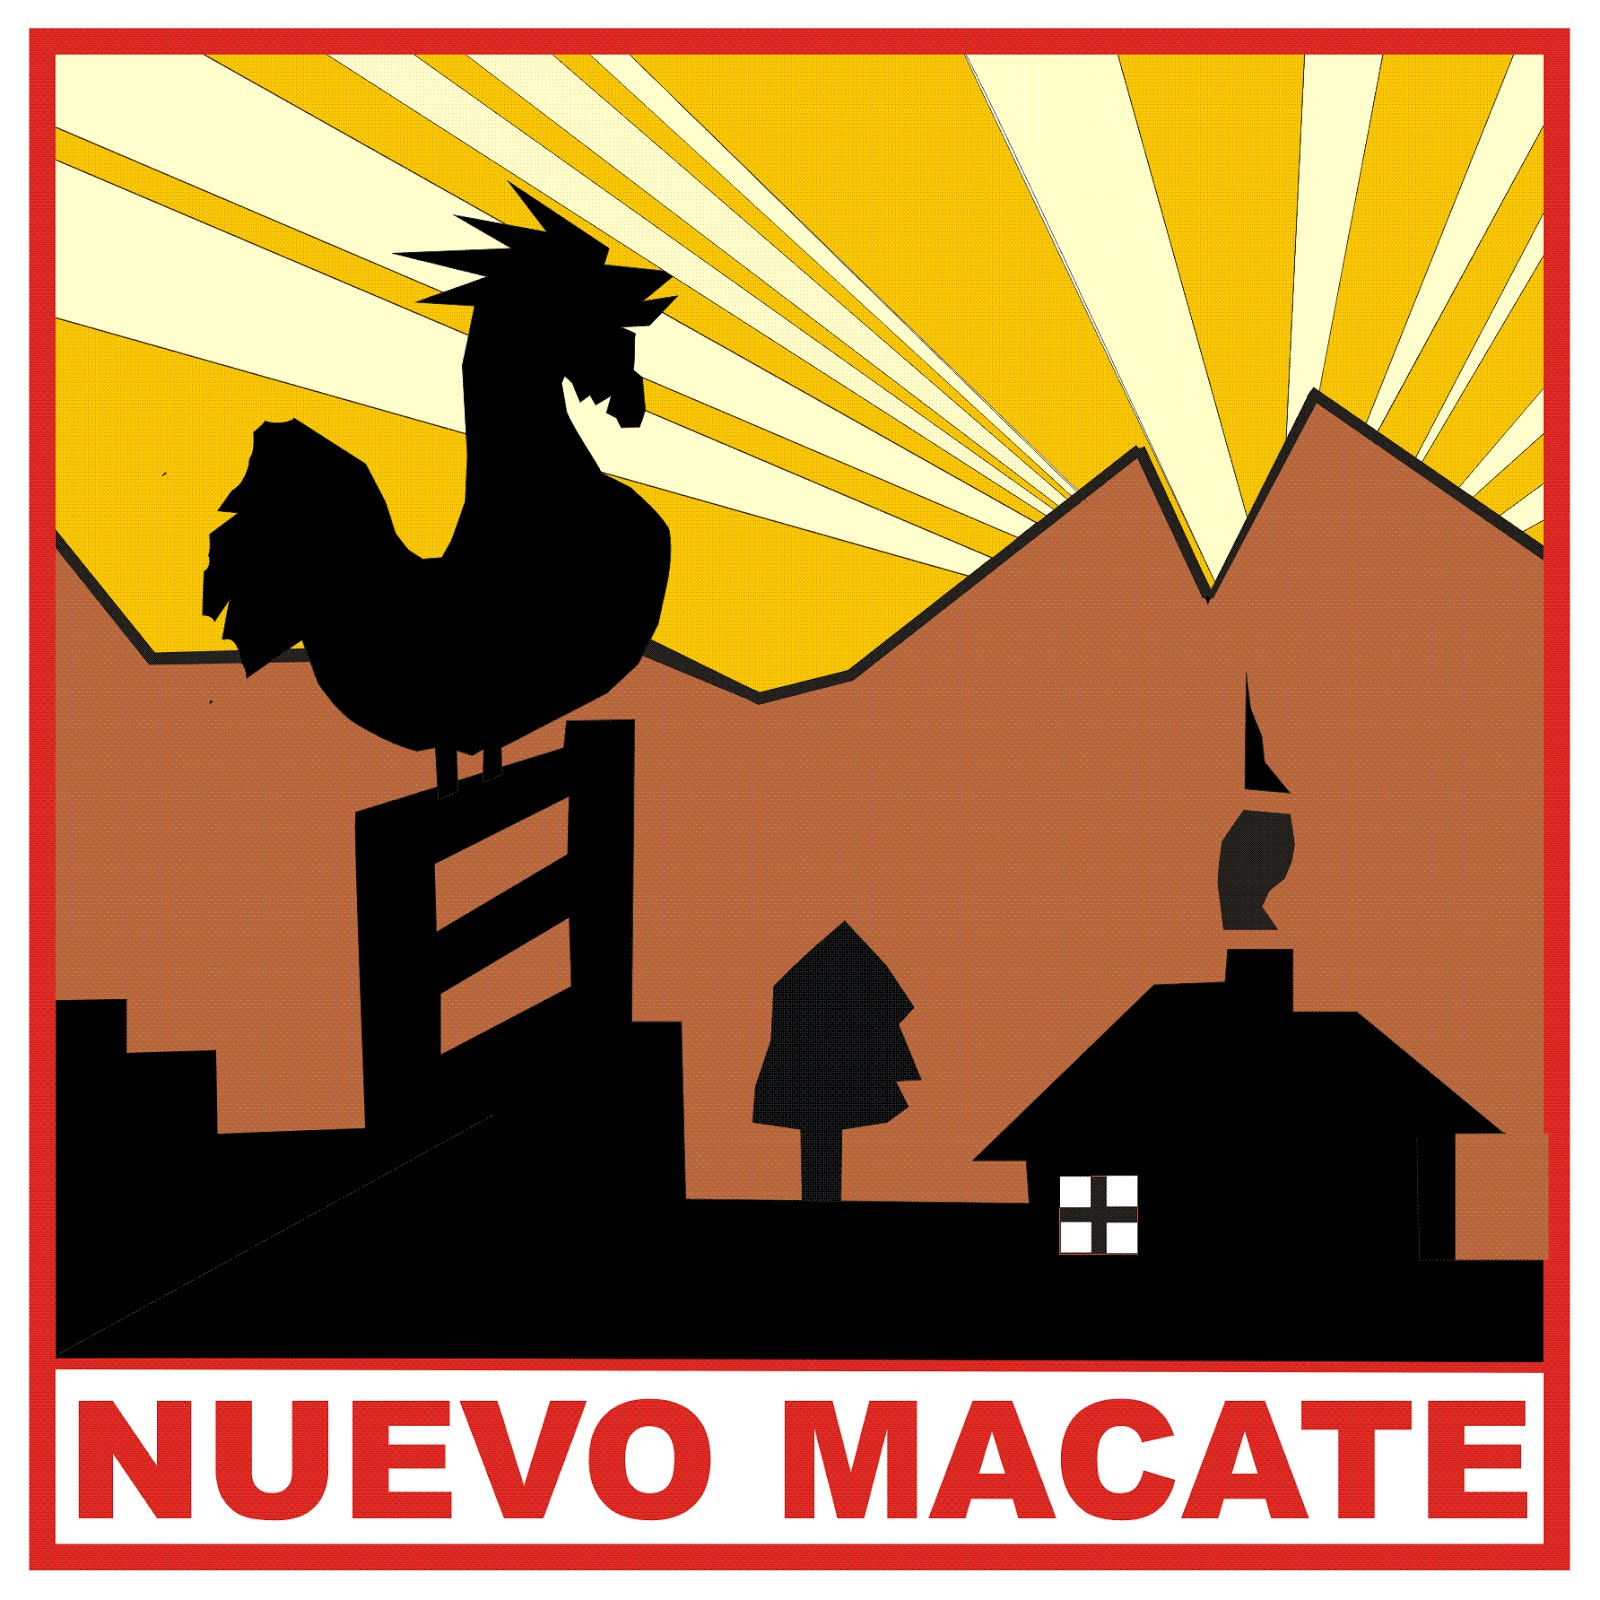 NUEVO MACATE